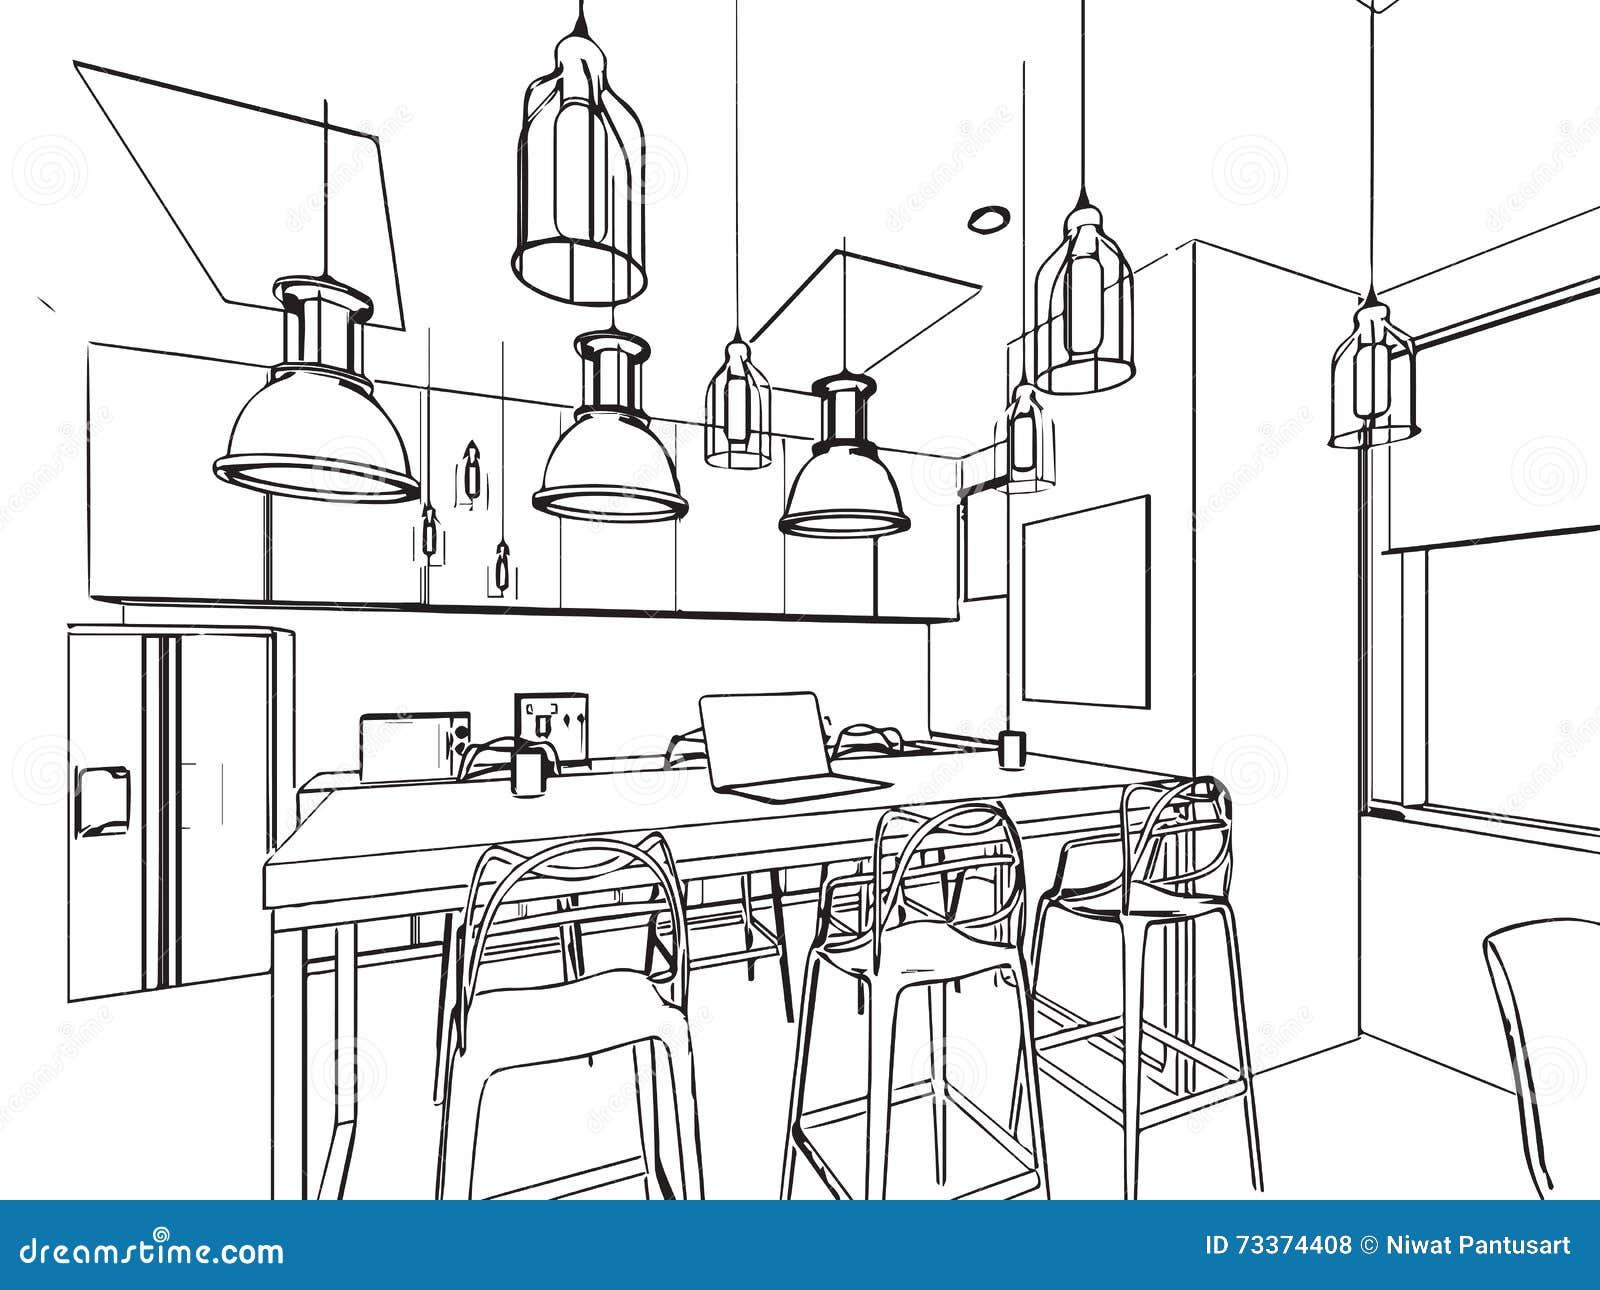 Perspectiva interior del dibujo de bosquejo del esquema de la casa ilustraci n del vector - Sala da pranzo dwg ...